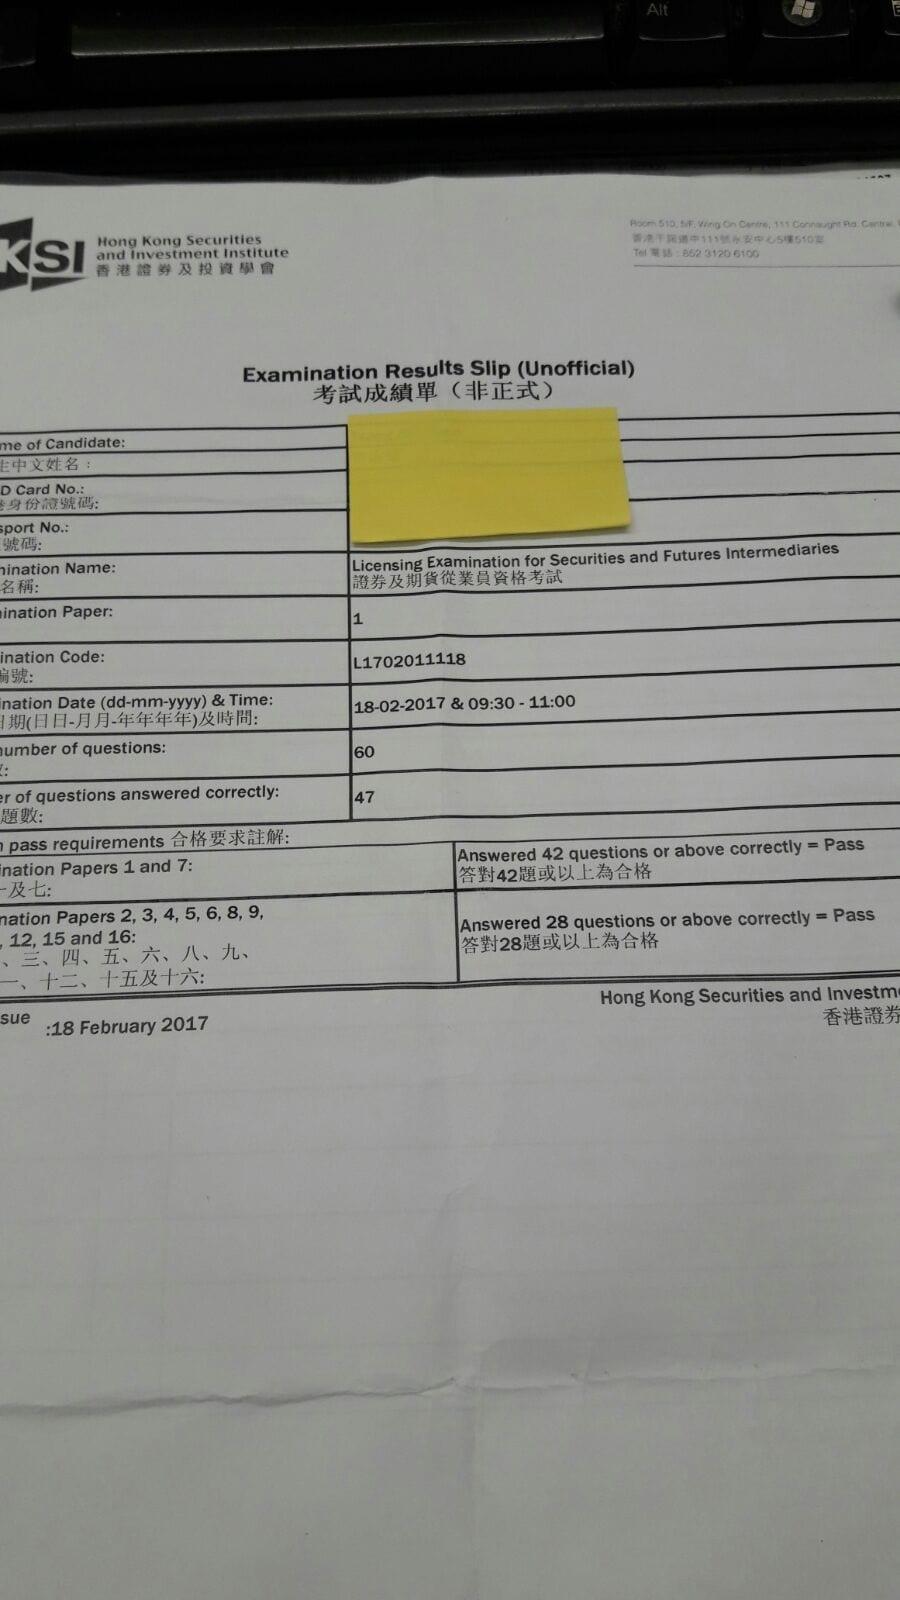 TCY 18/2/2017 LE Paper 1 證券期貨從業員資格考試卷一 Pass